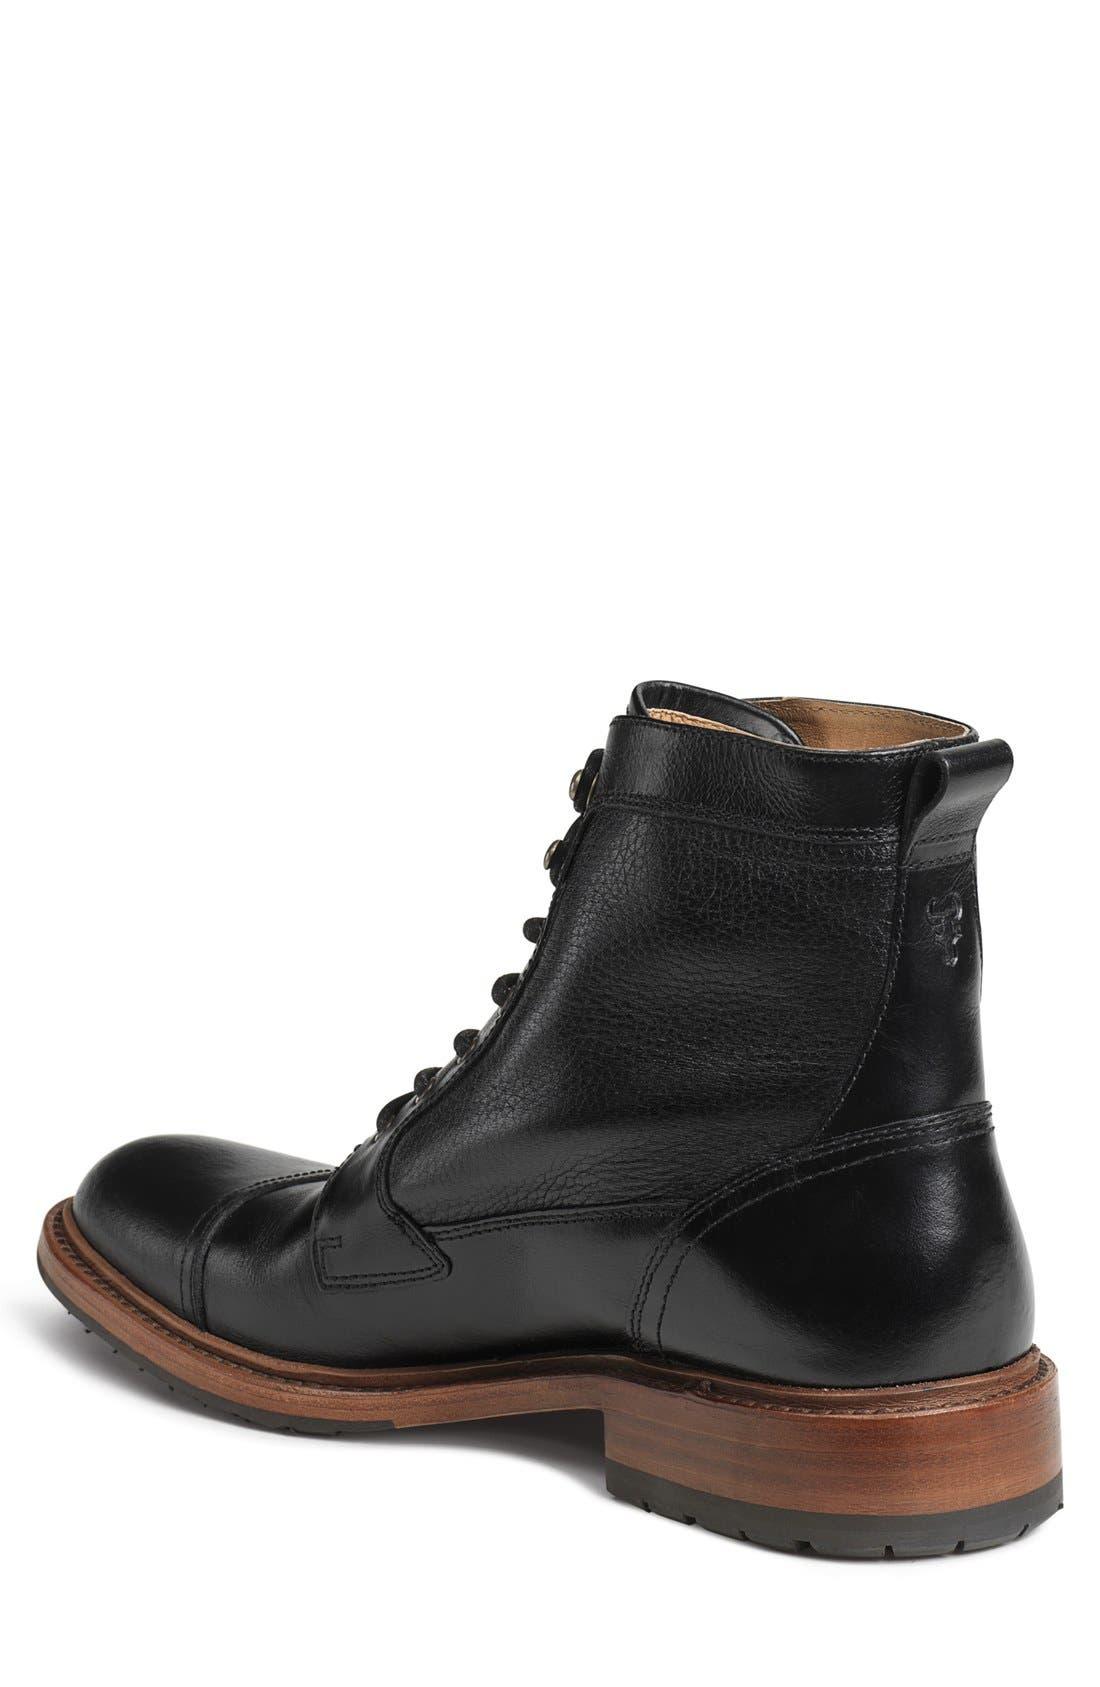 'Lowell' Cap Toe Boot,                             Alternate thumbnail 2, color,                             BLACK